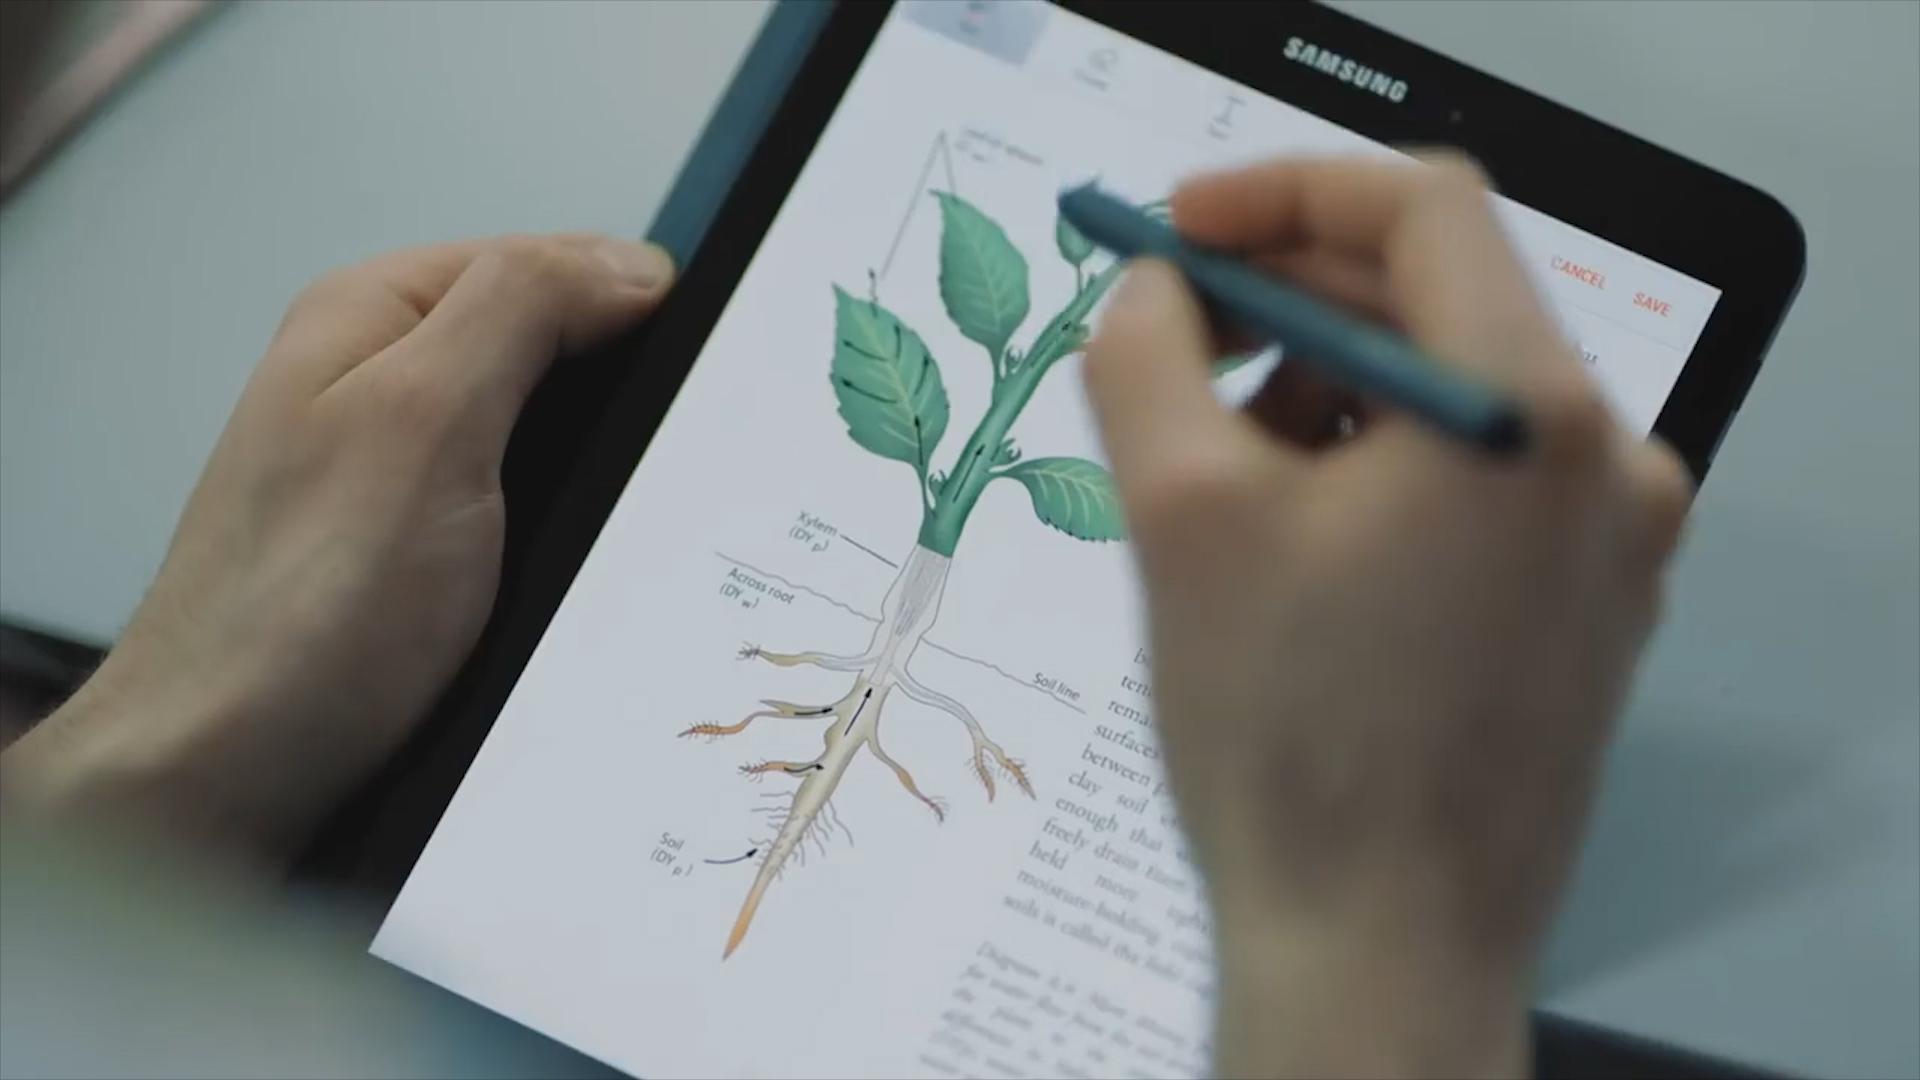 Samsung Galaxy Tab S4 Video - Square Elephant Productions